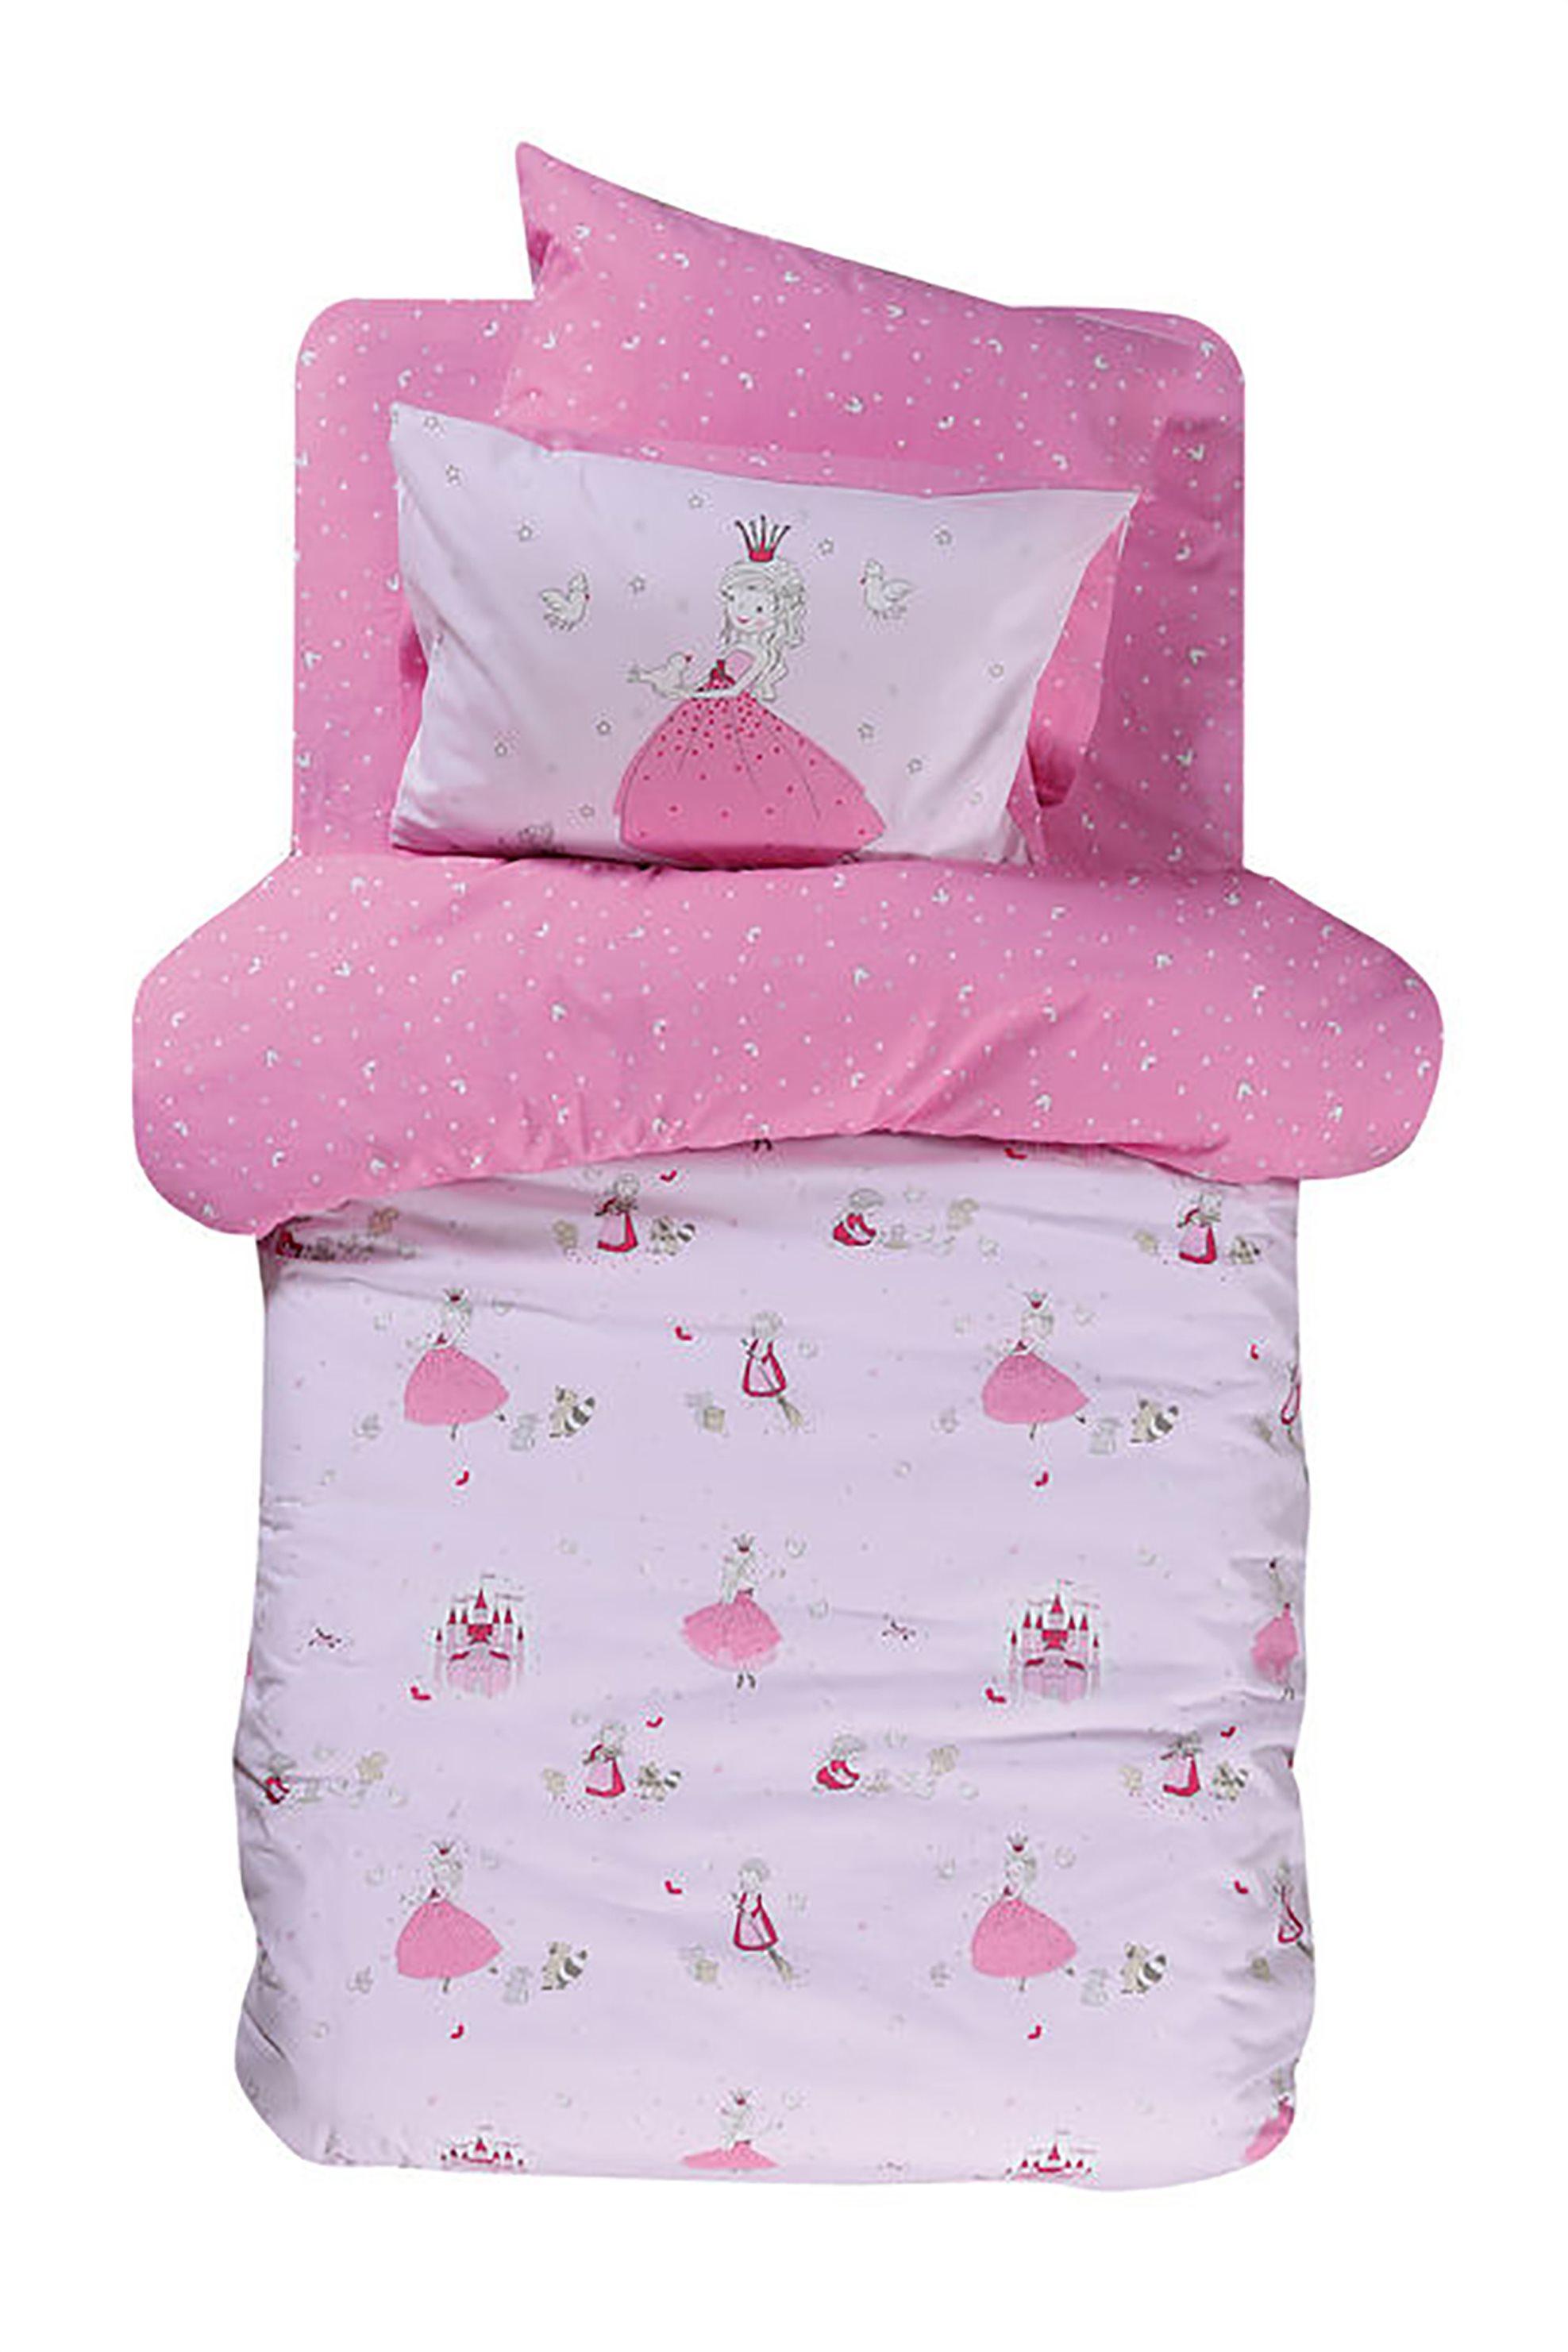 NEF-NEF Σετ παιδικά σεντόνια ροζ A Dream Come True (3 τεμάχια)  - 022264 - Μπλε home   παιδια   σεντόνια   σετ παιδικά σεντόνια